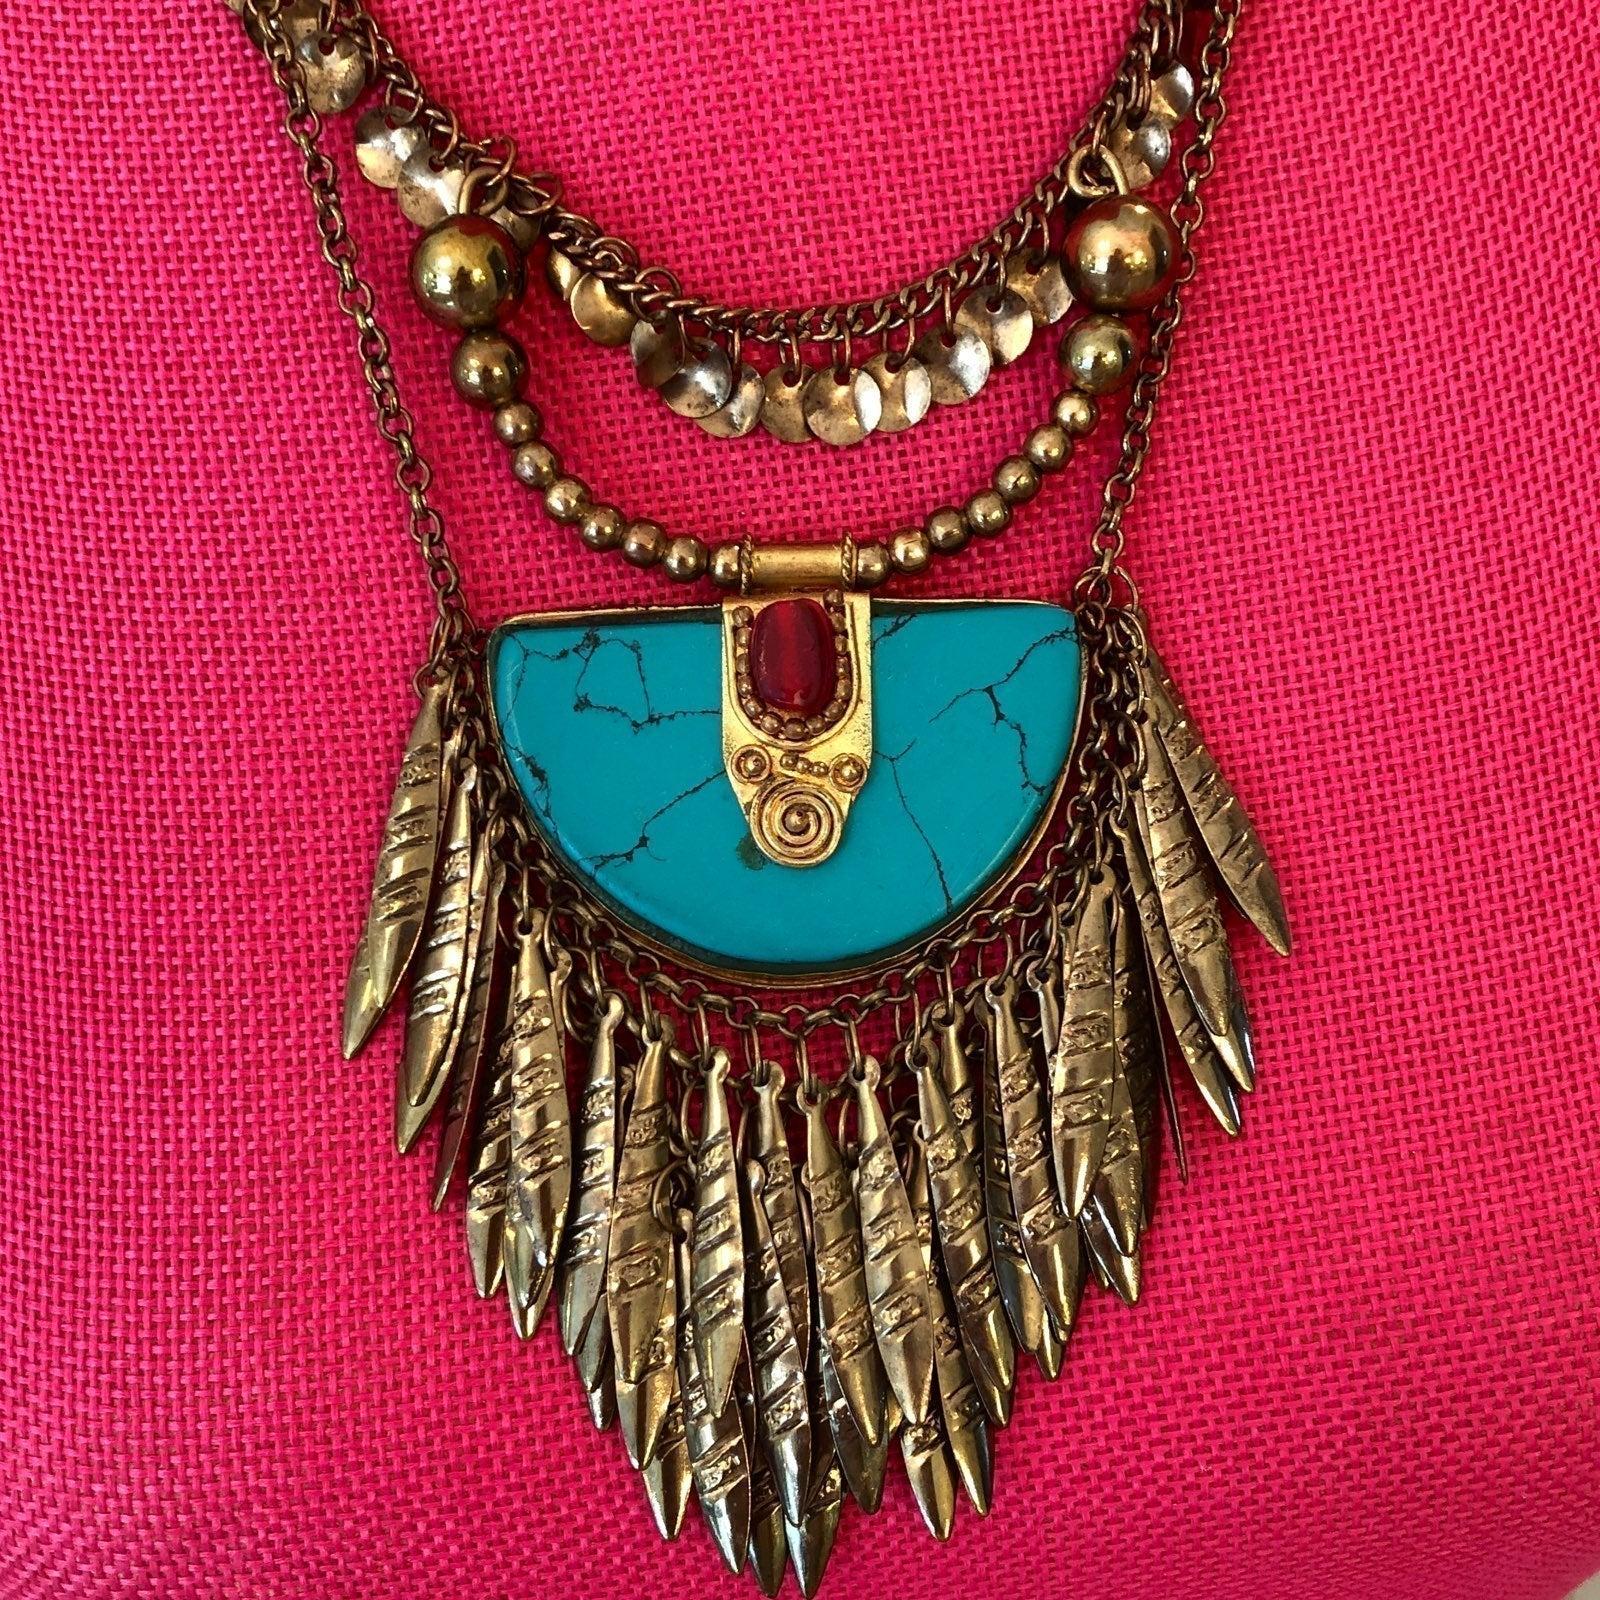 Buckle Necklace